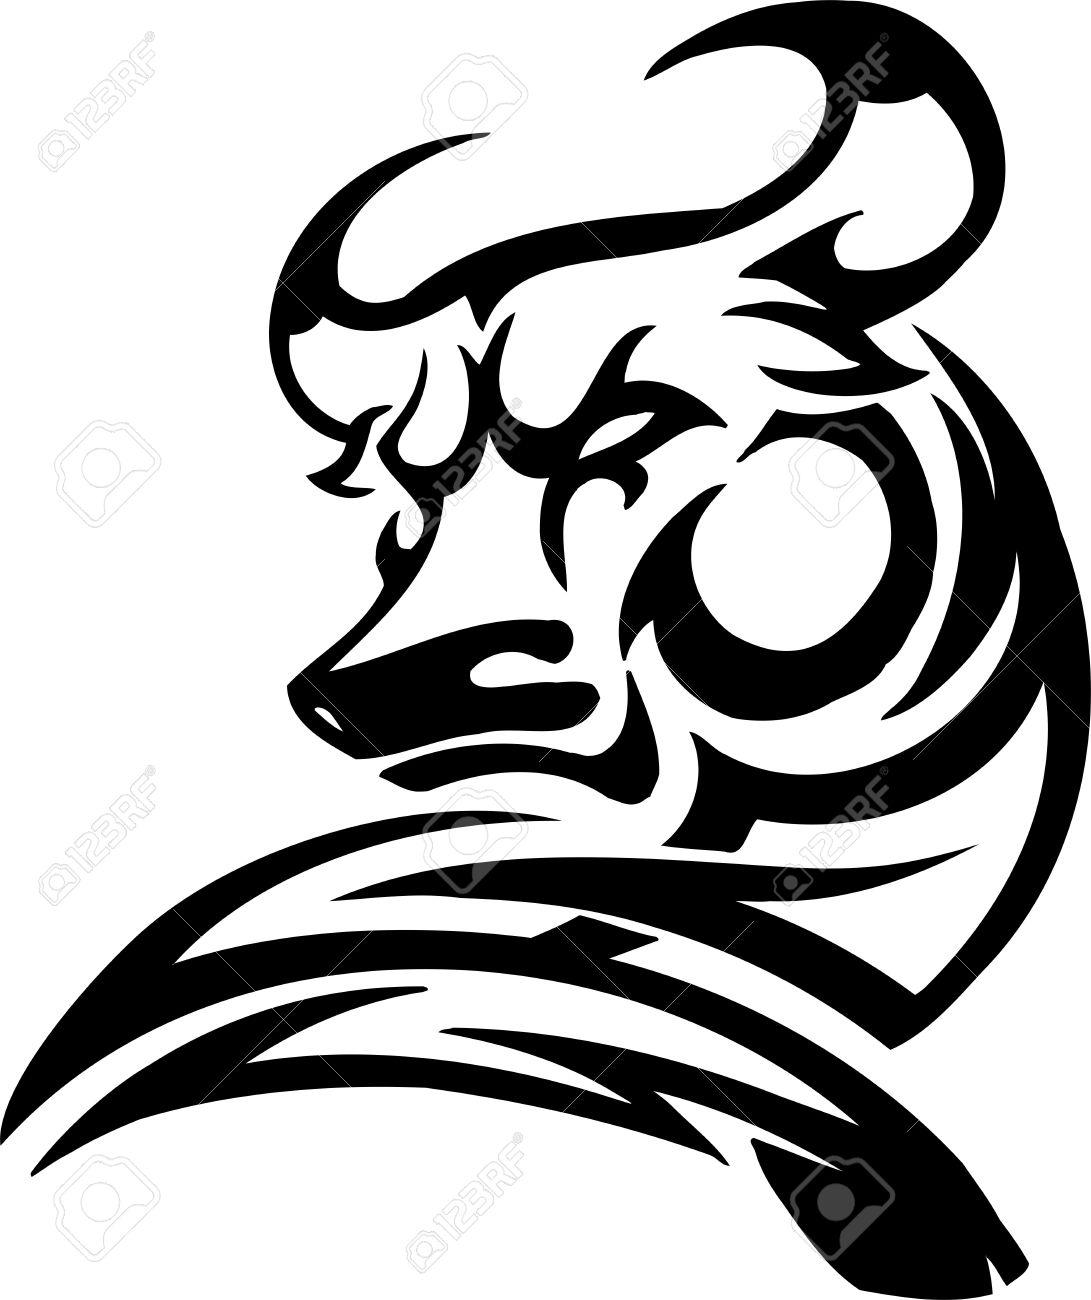 Bull in tribal style - vector image. Stock Vector - 12490613